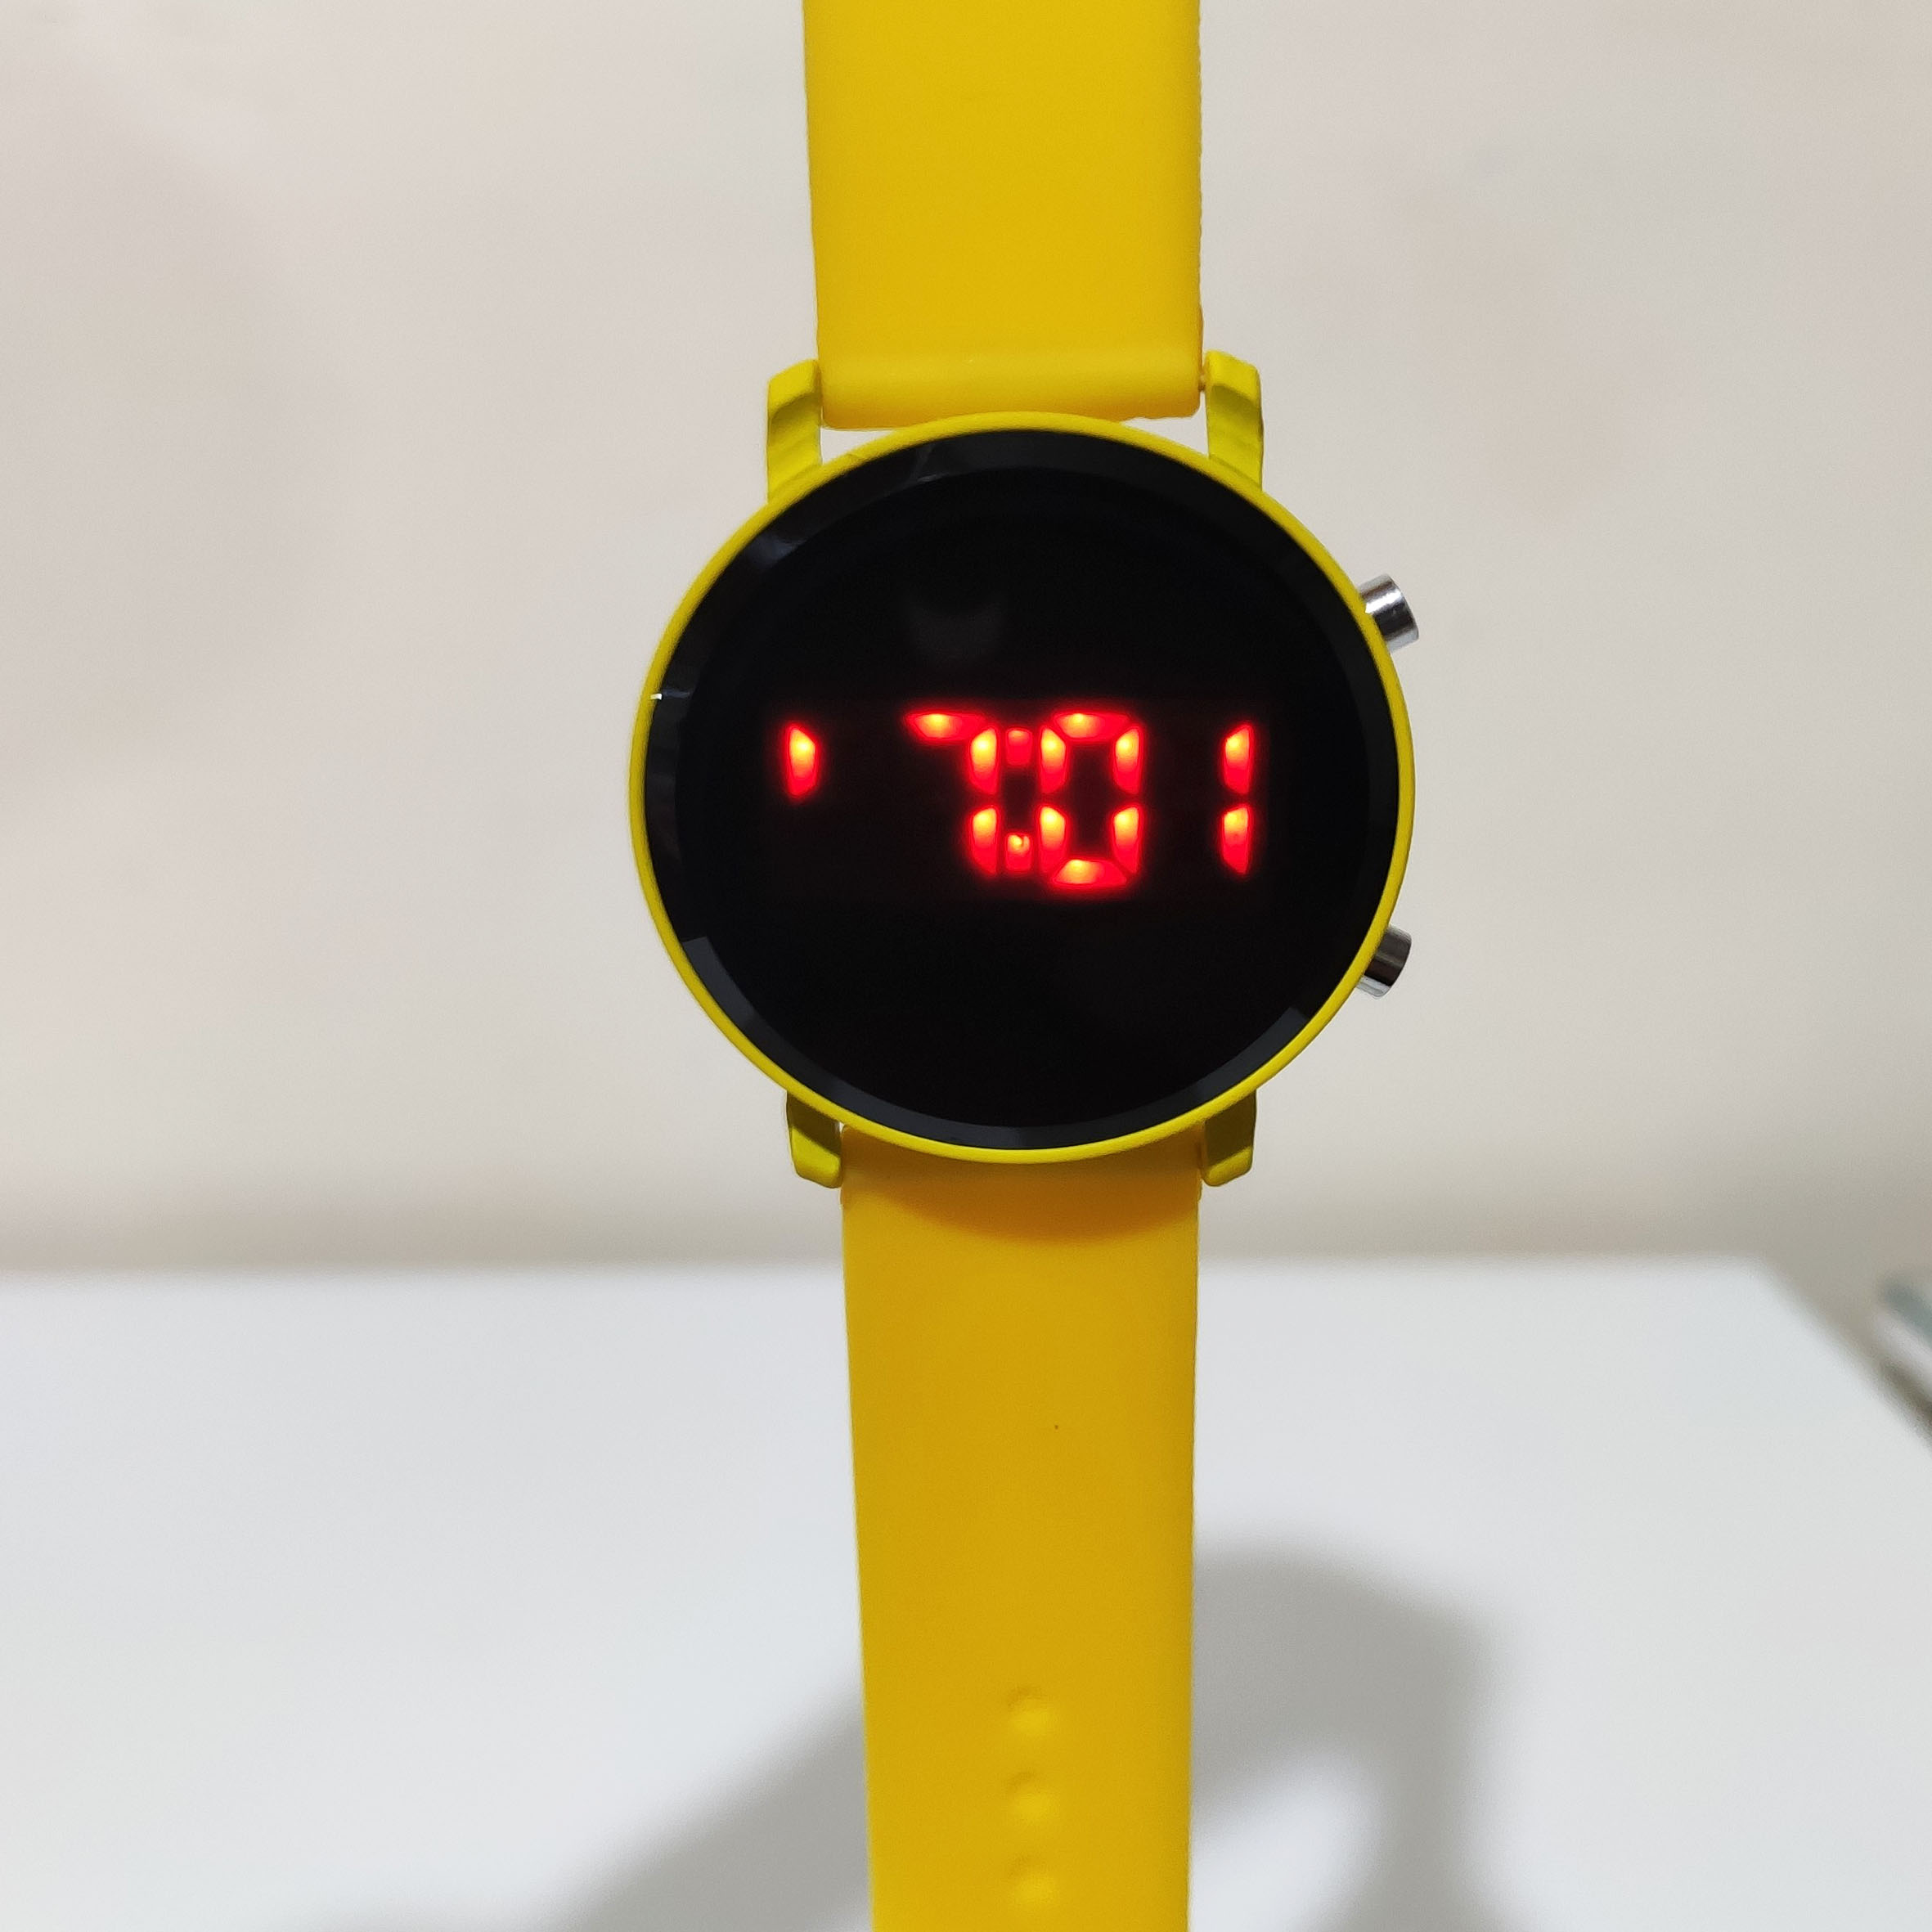 ساعت مچی دیجیتال مدل x9